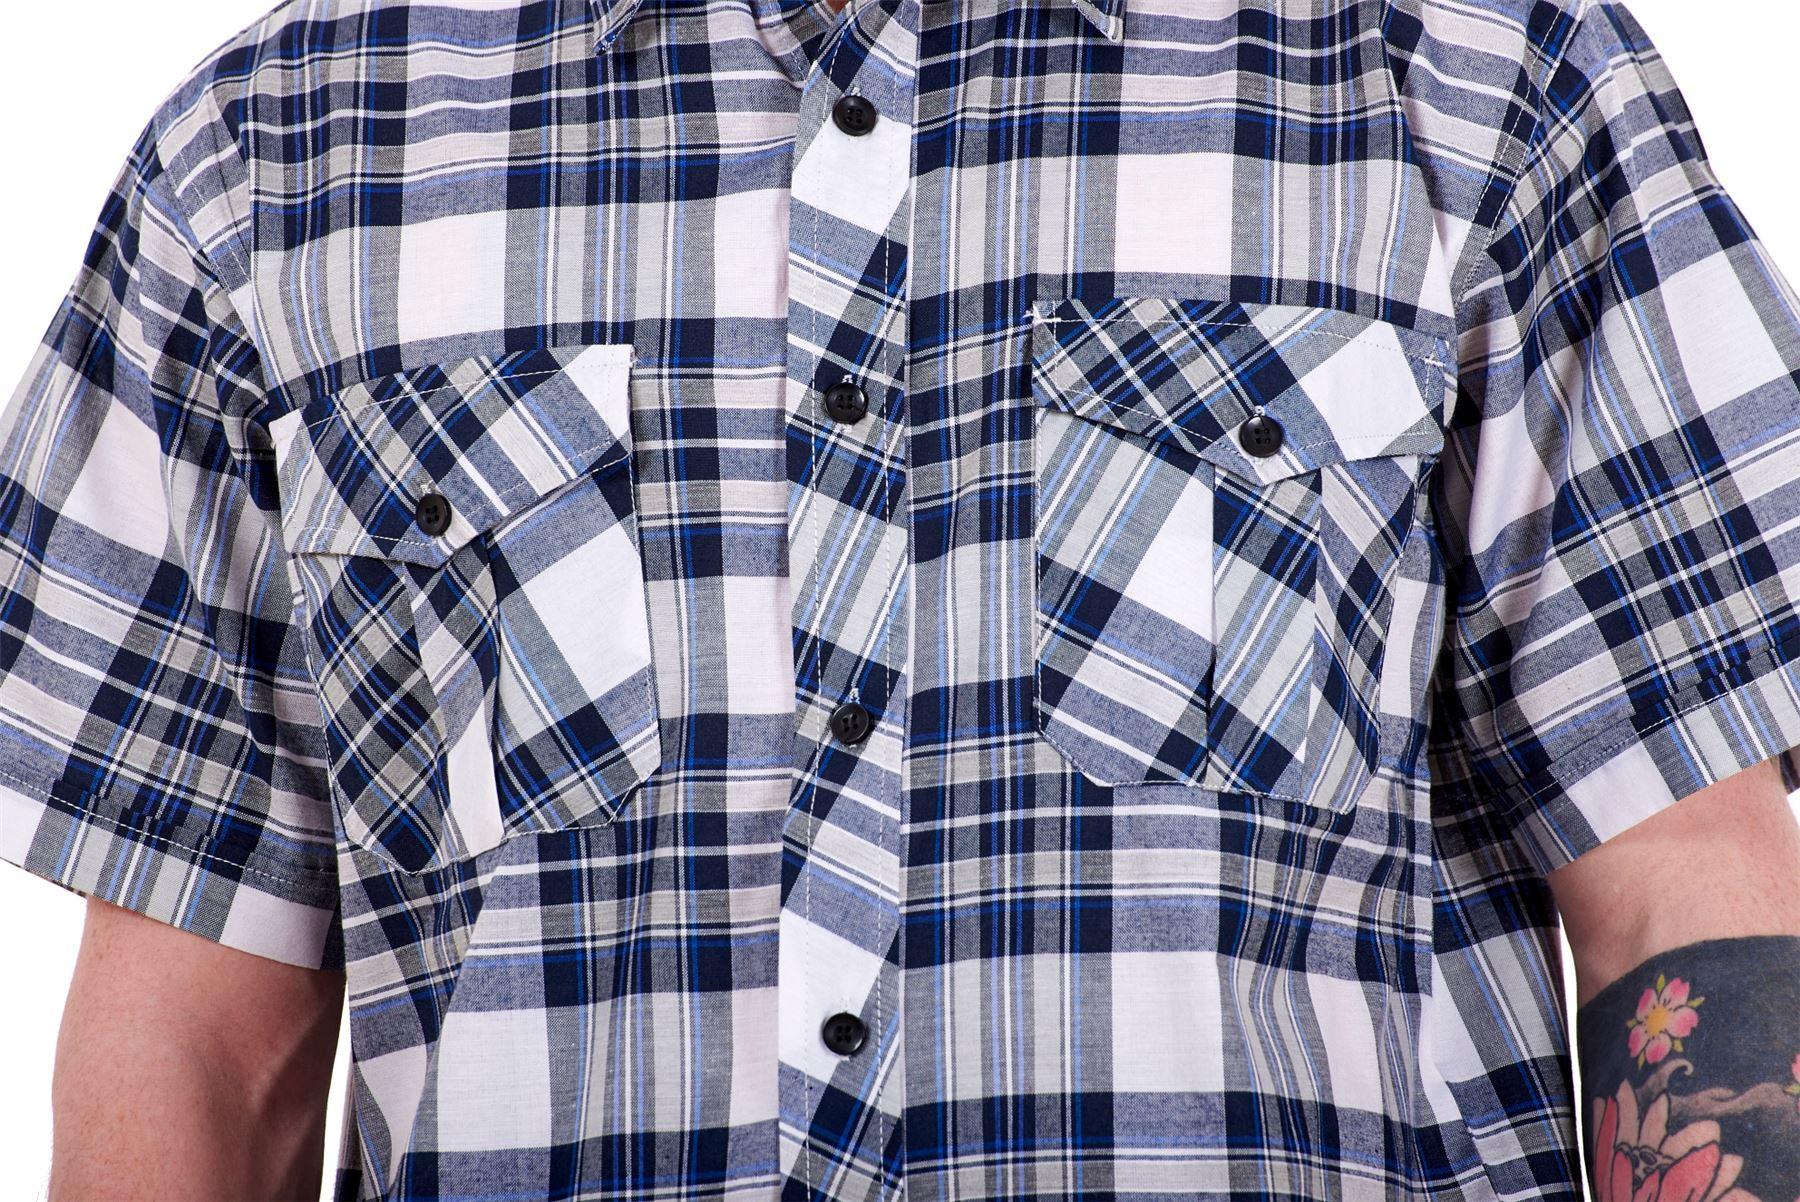 Mens-Regular-Big-Size-Shirts-Checked-Cotton-Blend-Casual-Short-Sleeve-M-to-5XL thumbnail 12